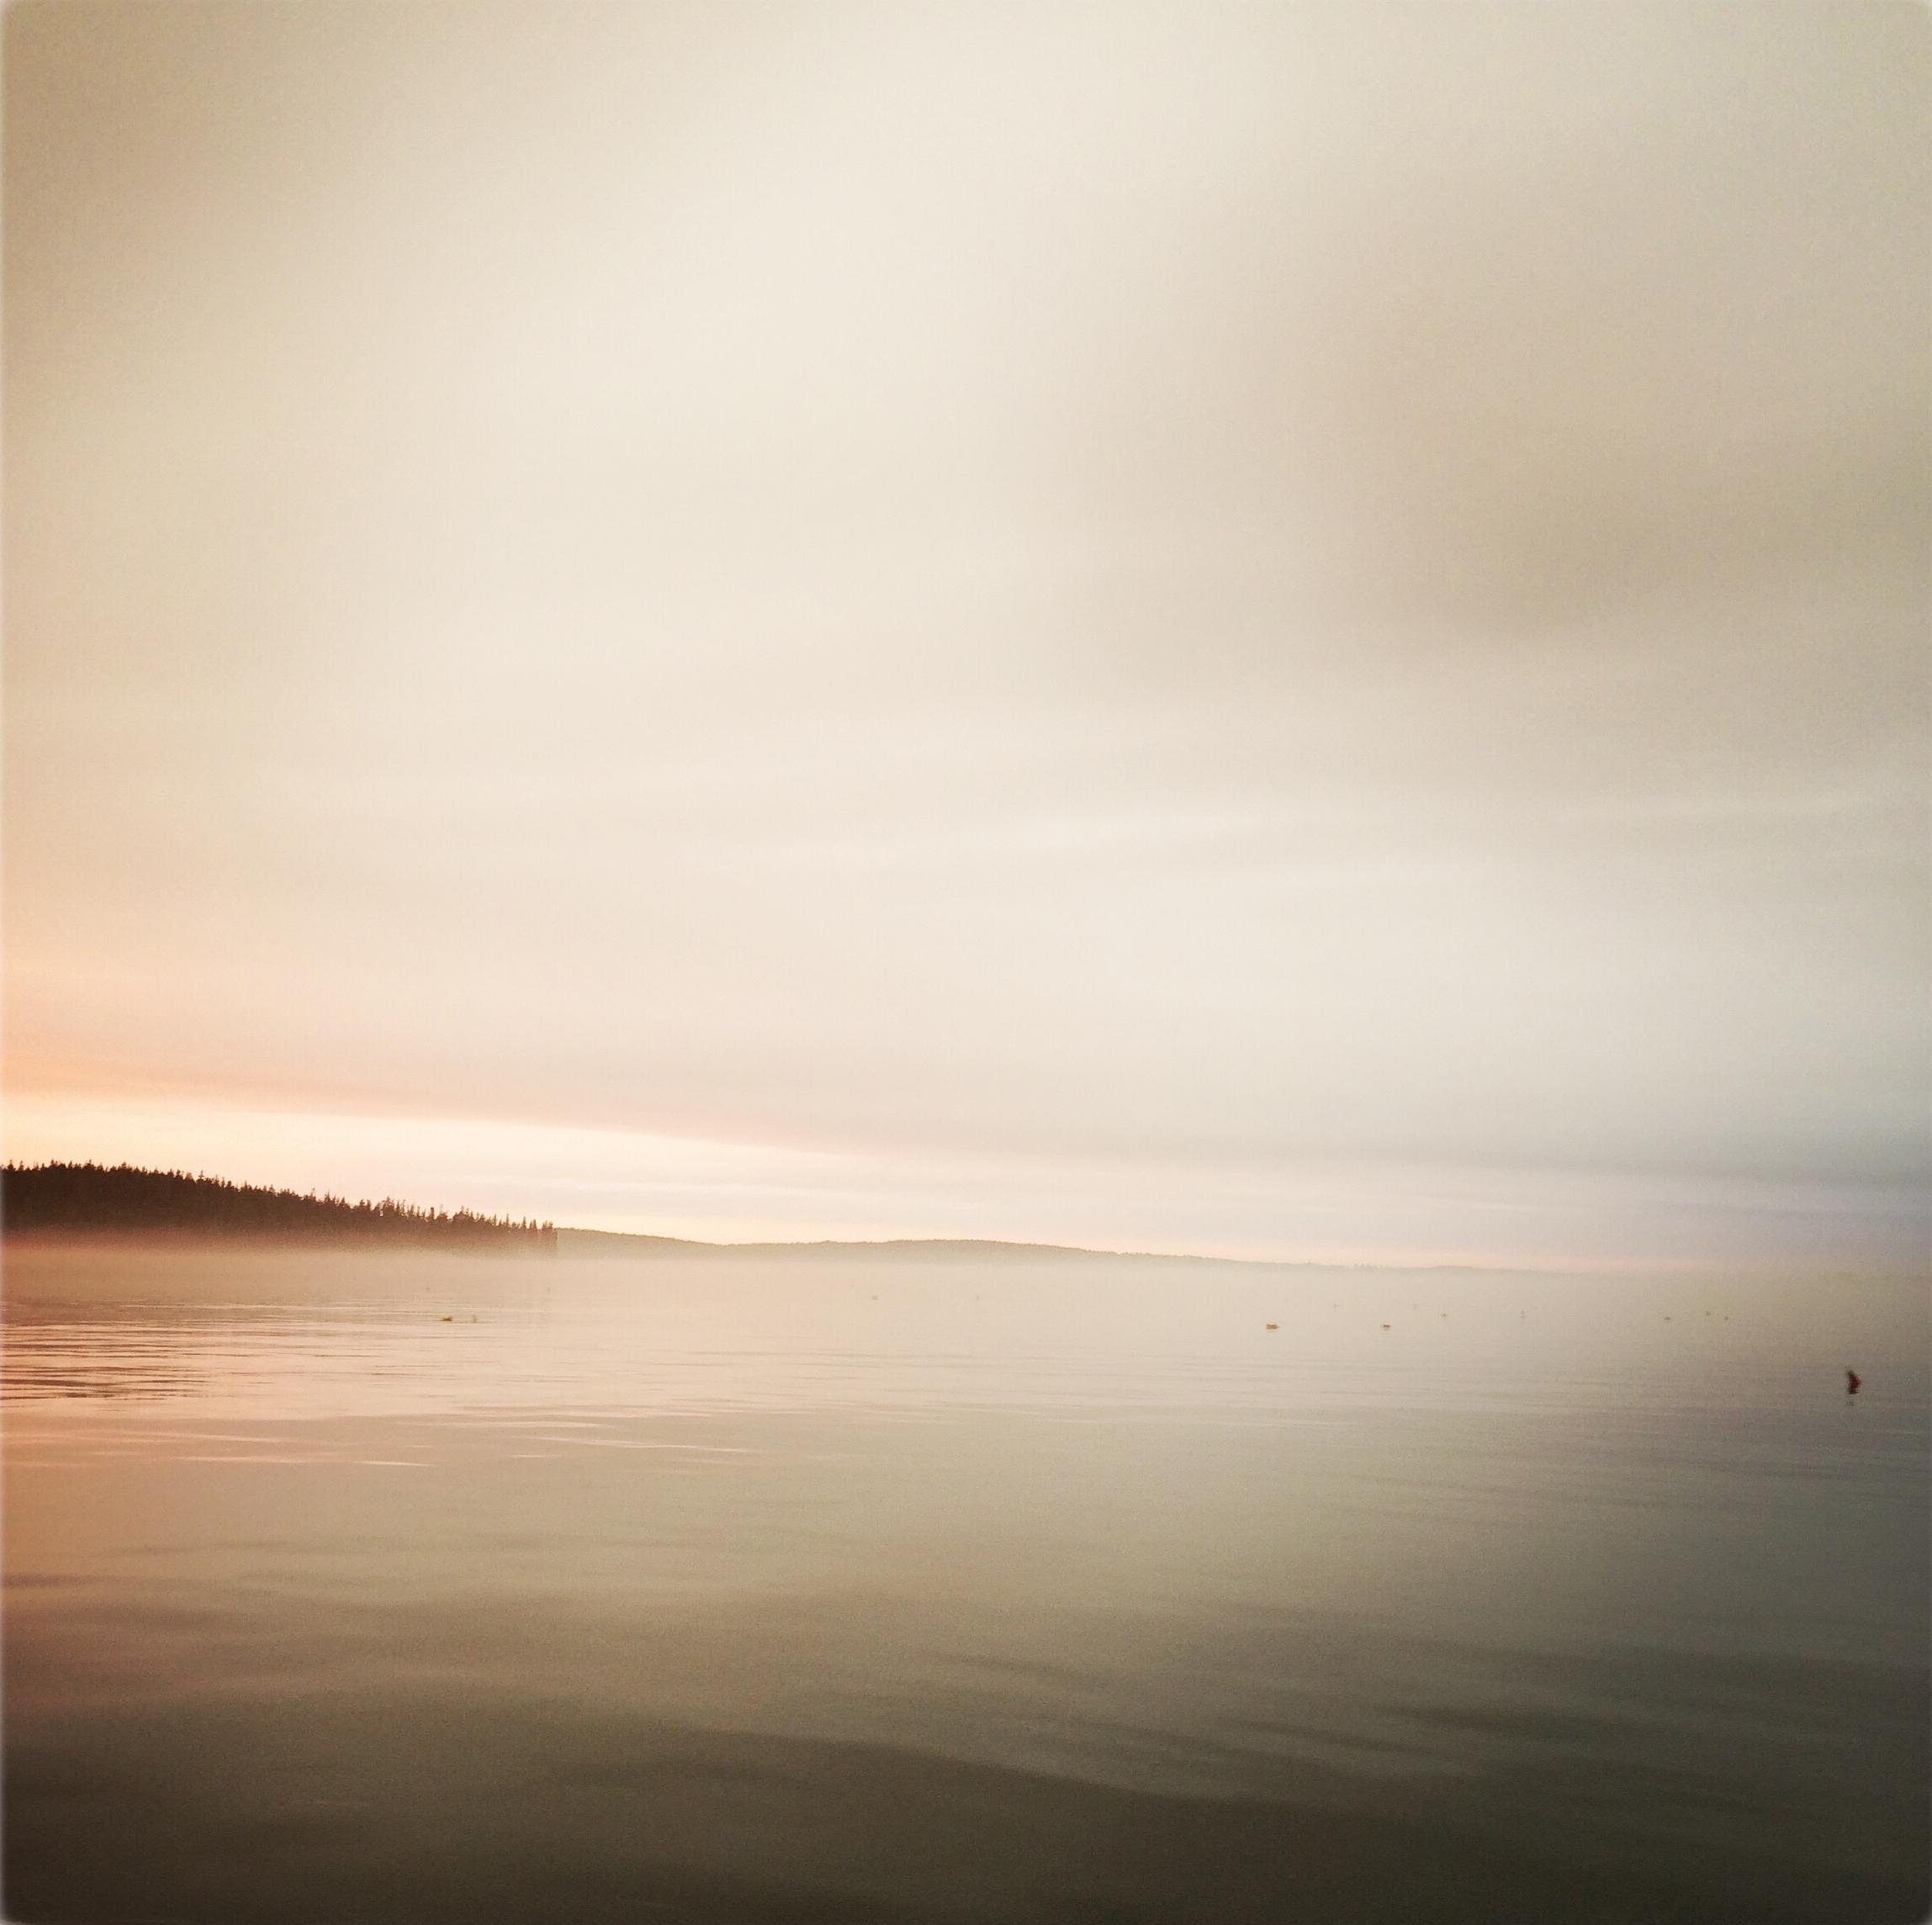 SUNSET EMPTY OCEAN.JPG